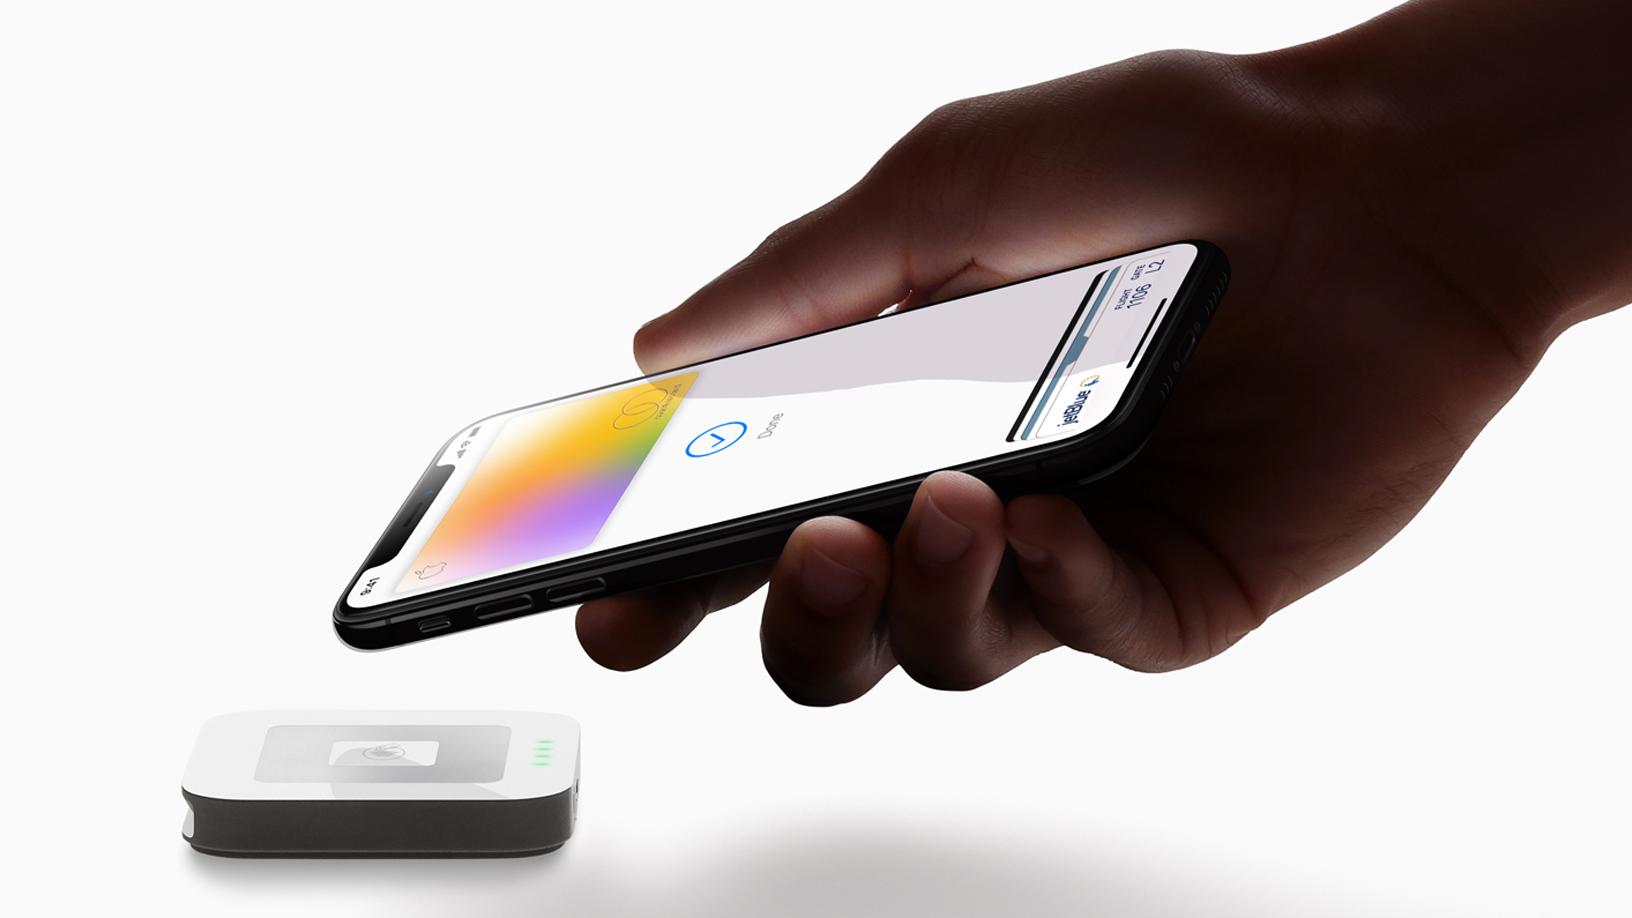 A man's hand holding an iPhone over a digital payment reader.